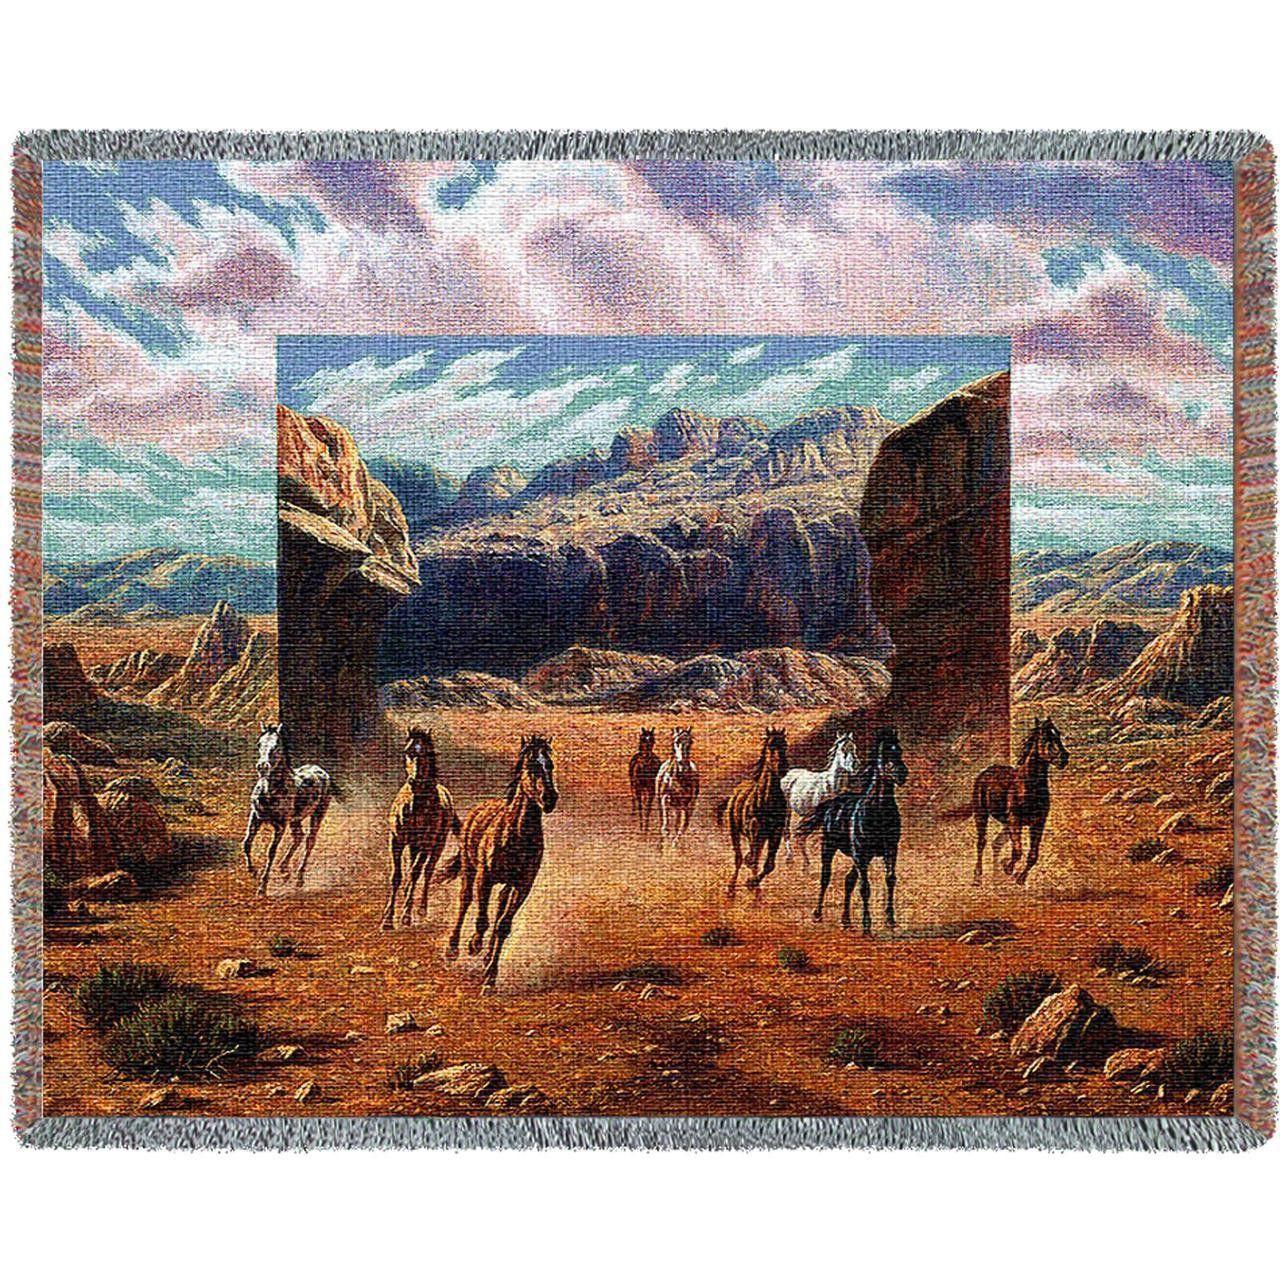 Running Horses Art Tapestry Throw